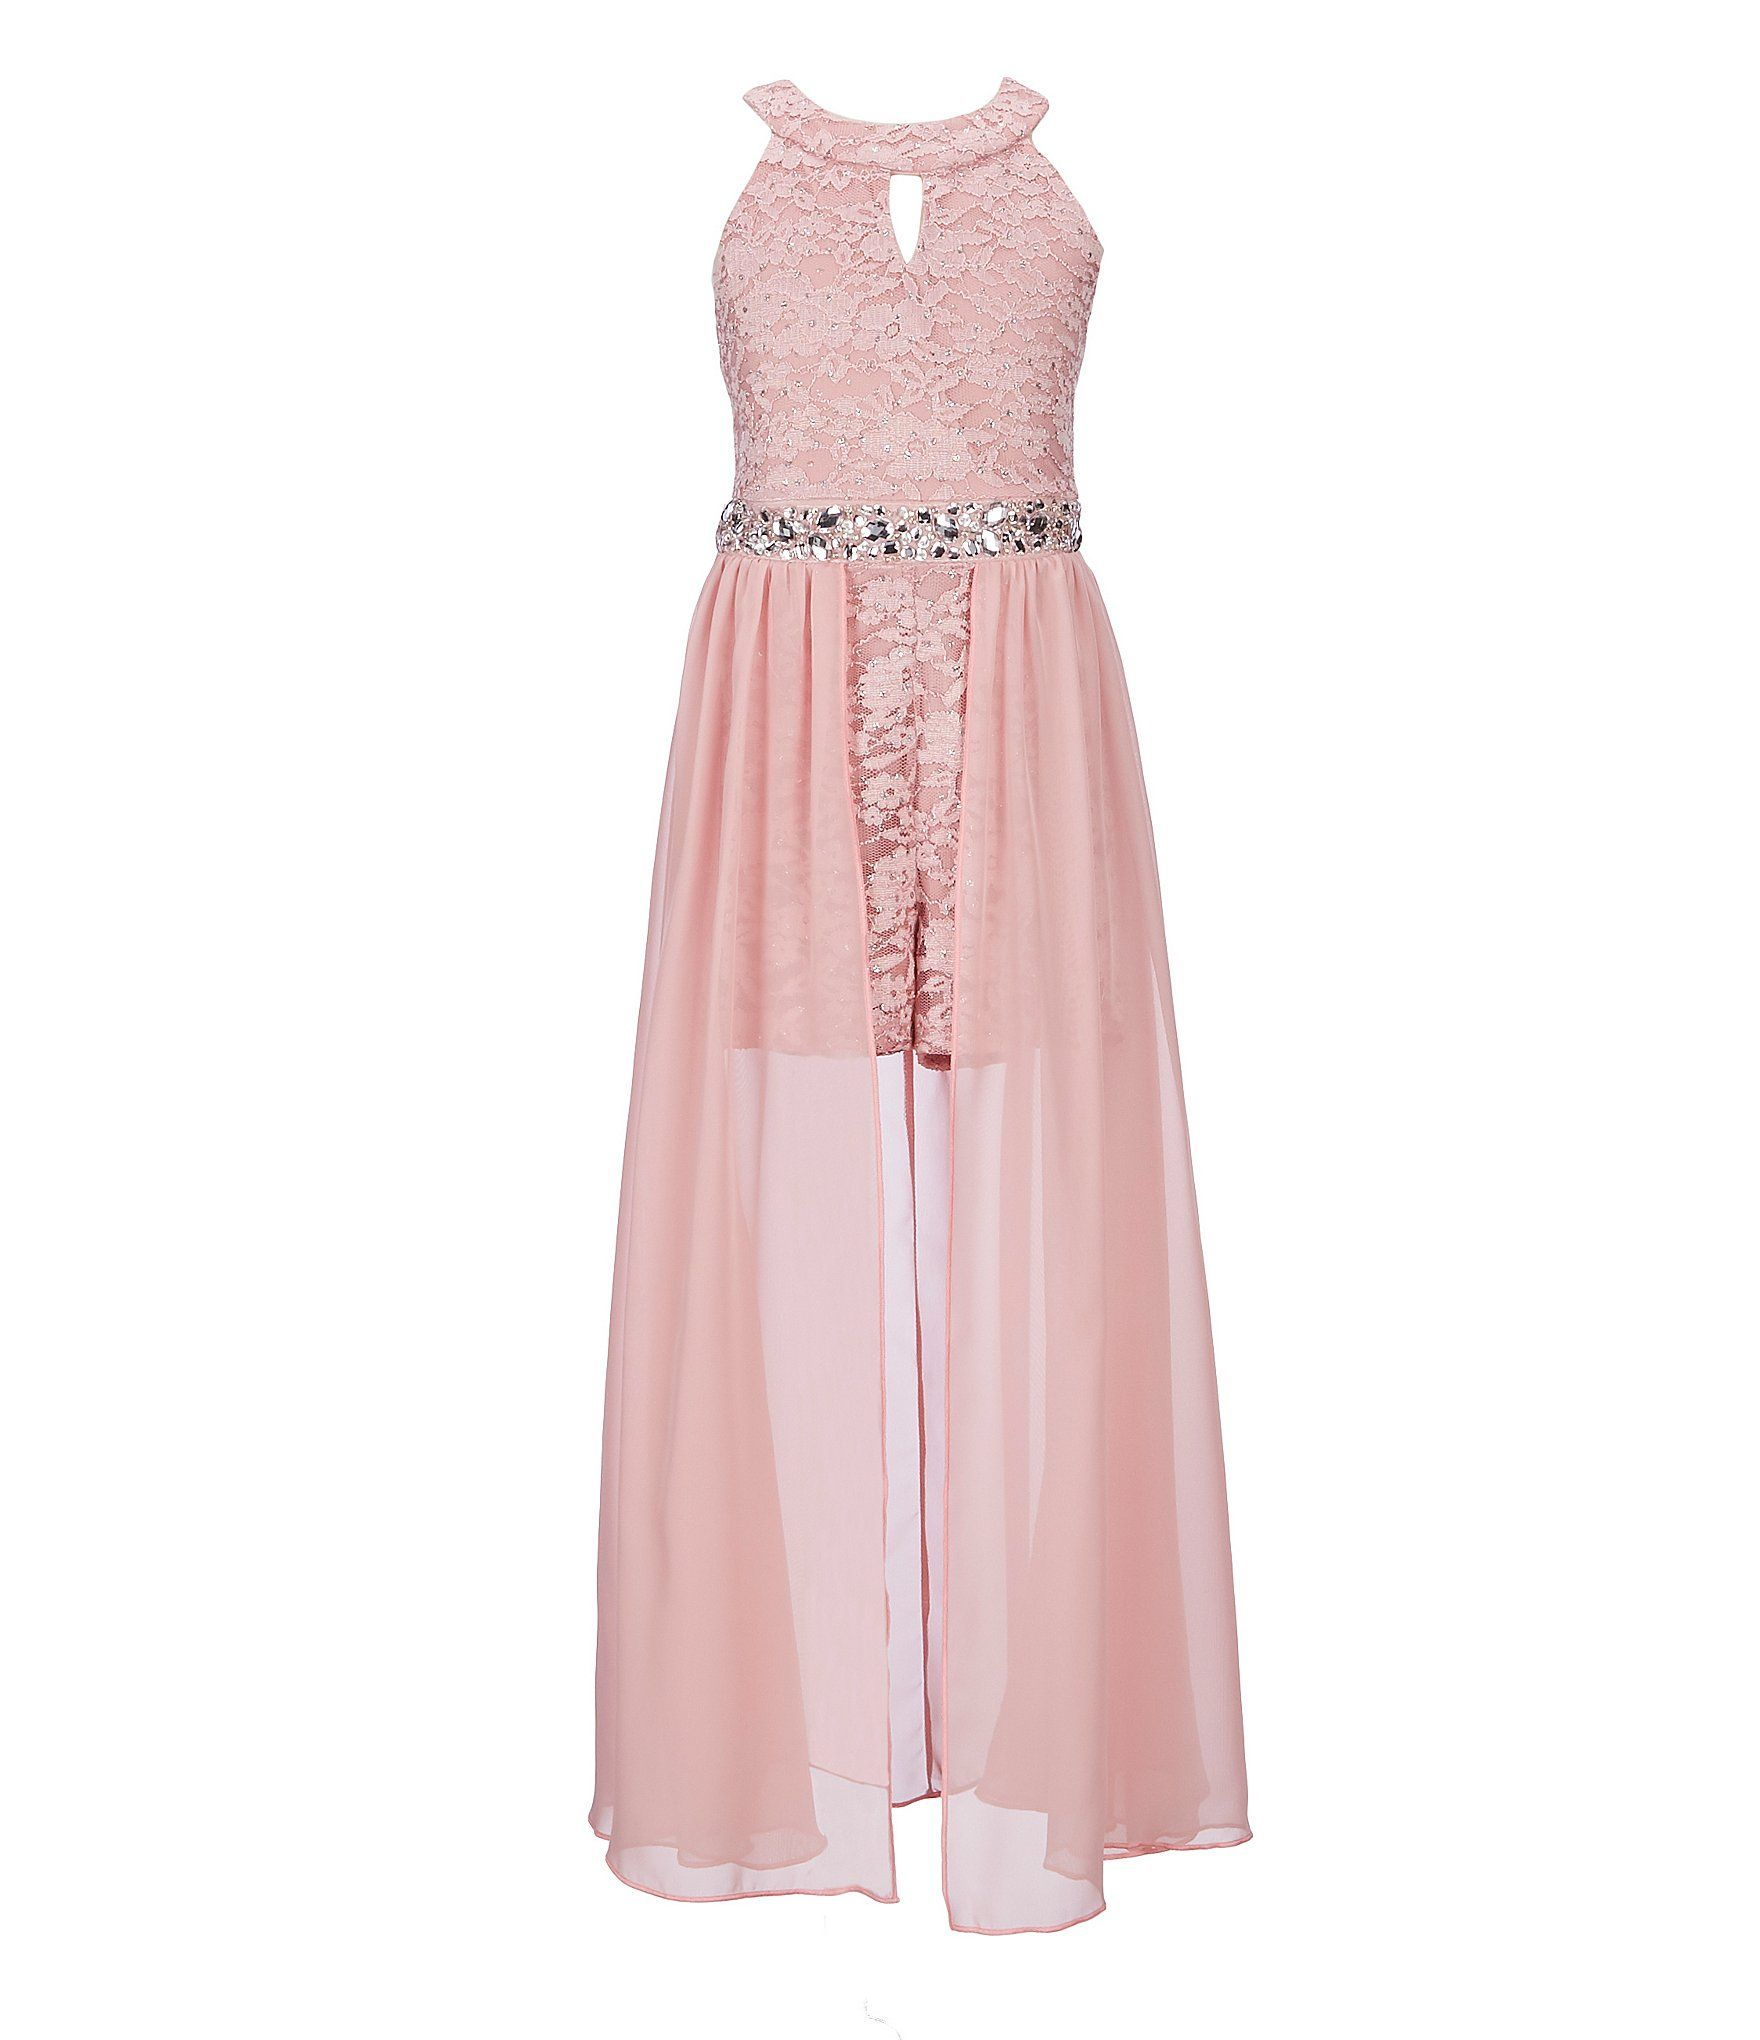 af89f7da997c Shop for Xtraordinary Big Girls 7-16 Glitter-Lace Chiffon Maxi Romper at  Dillards.com. Visit Dillards.com to find clothing